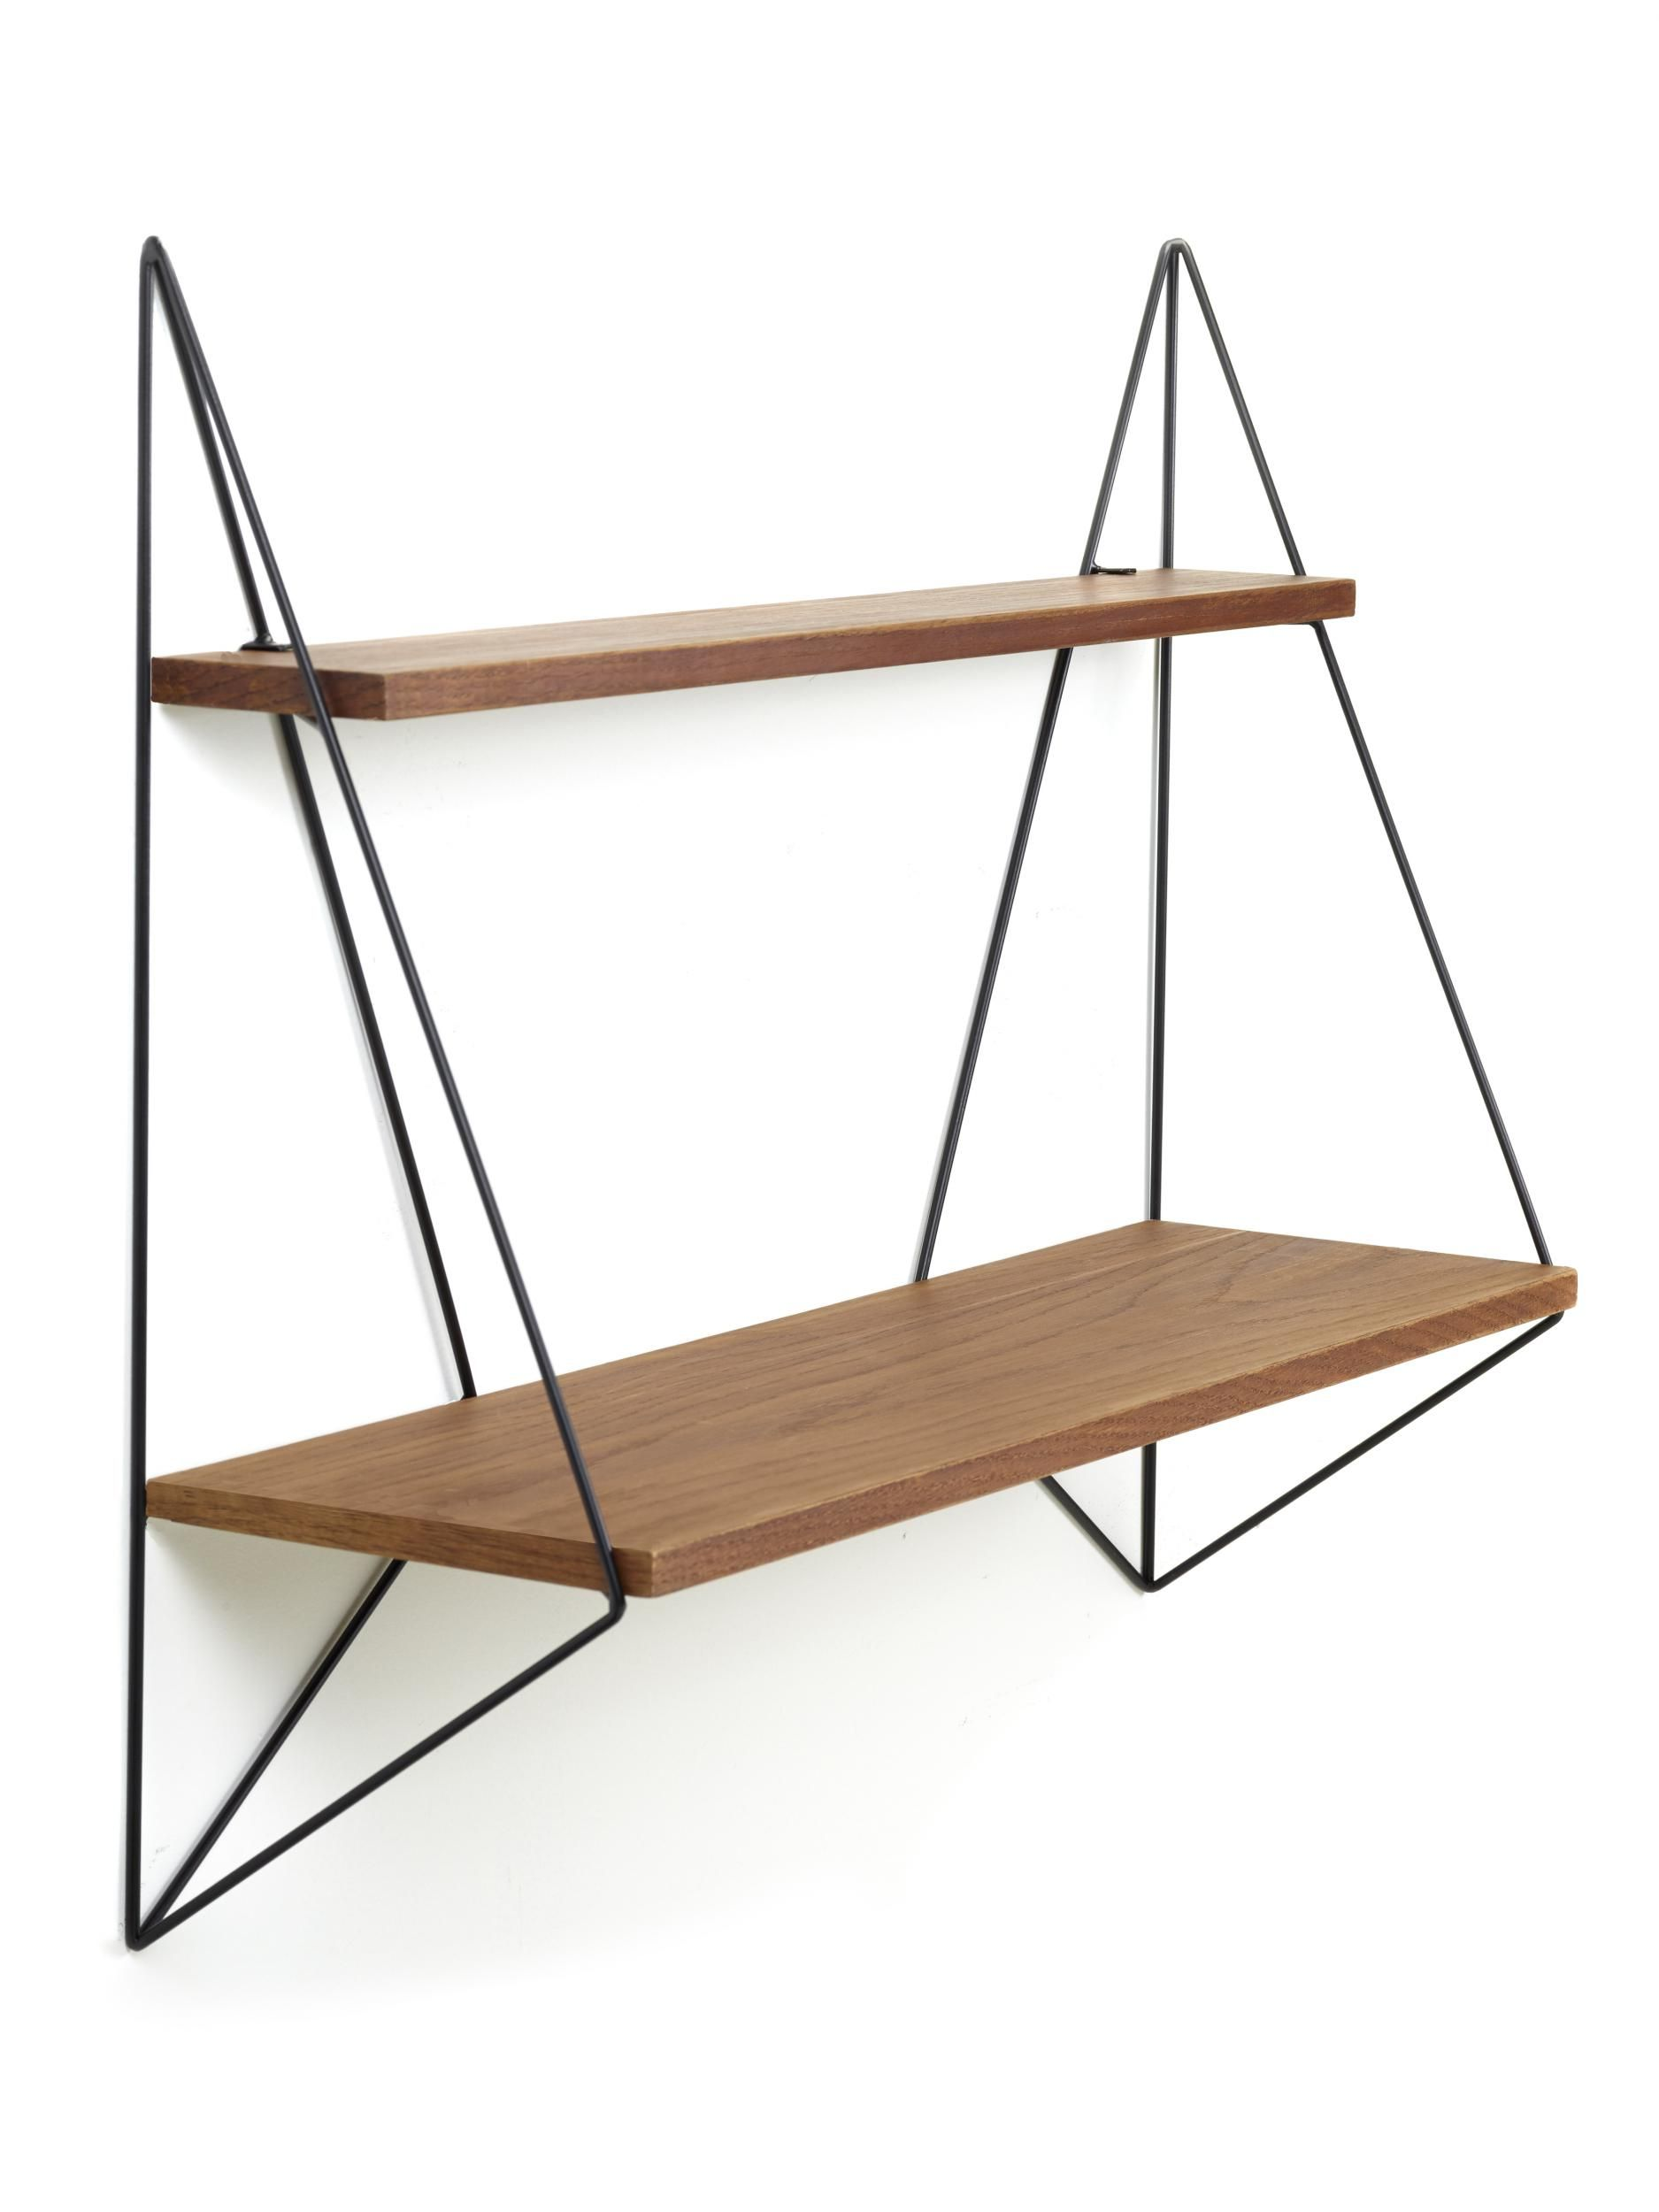 butterfly regal l 75 cm x h 64 cm eiche natur gestell schwarz by serax made in design. Black Bedroom Furniture Sets. Home Design Ideas